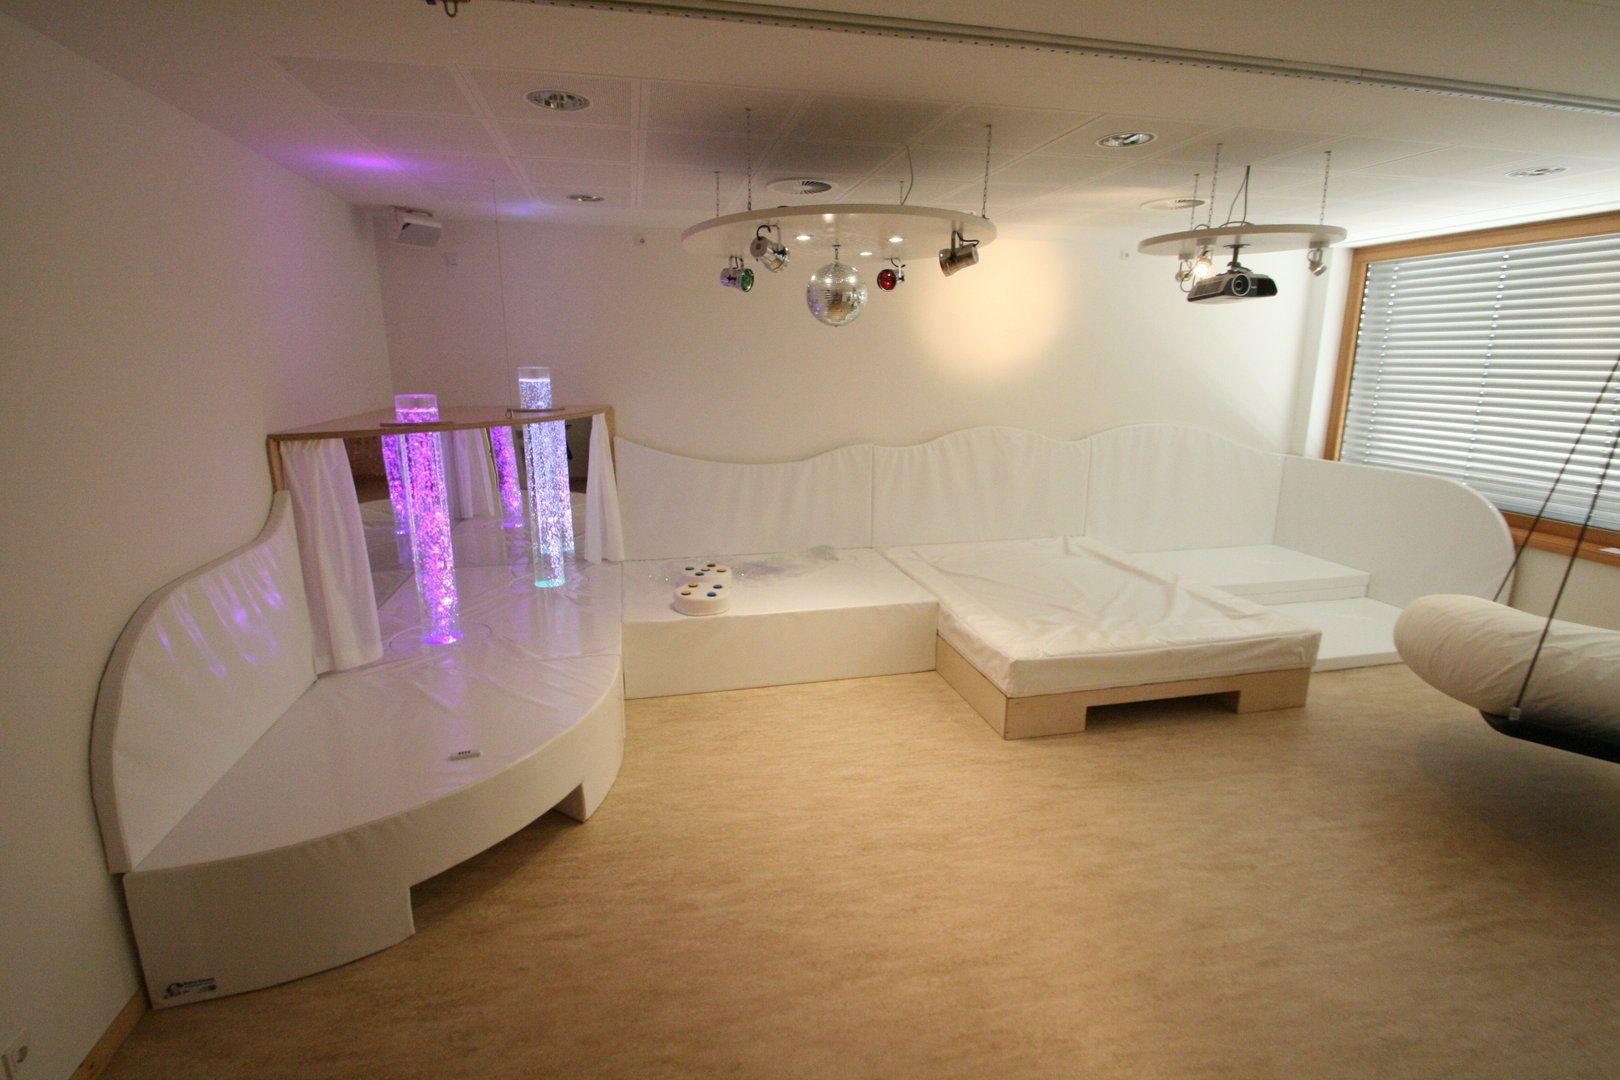 Podest Wohnzimmer  Jtleigh.com - Hausgestaltung Ideen